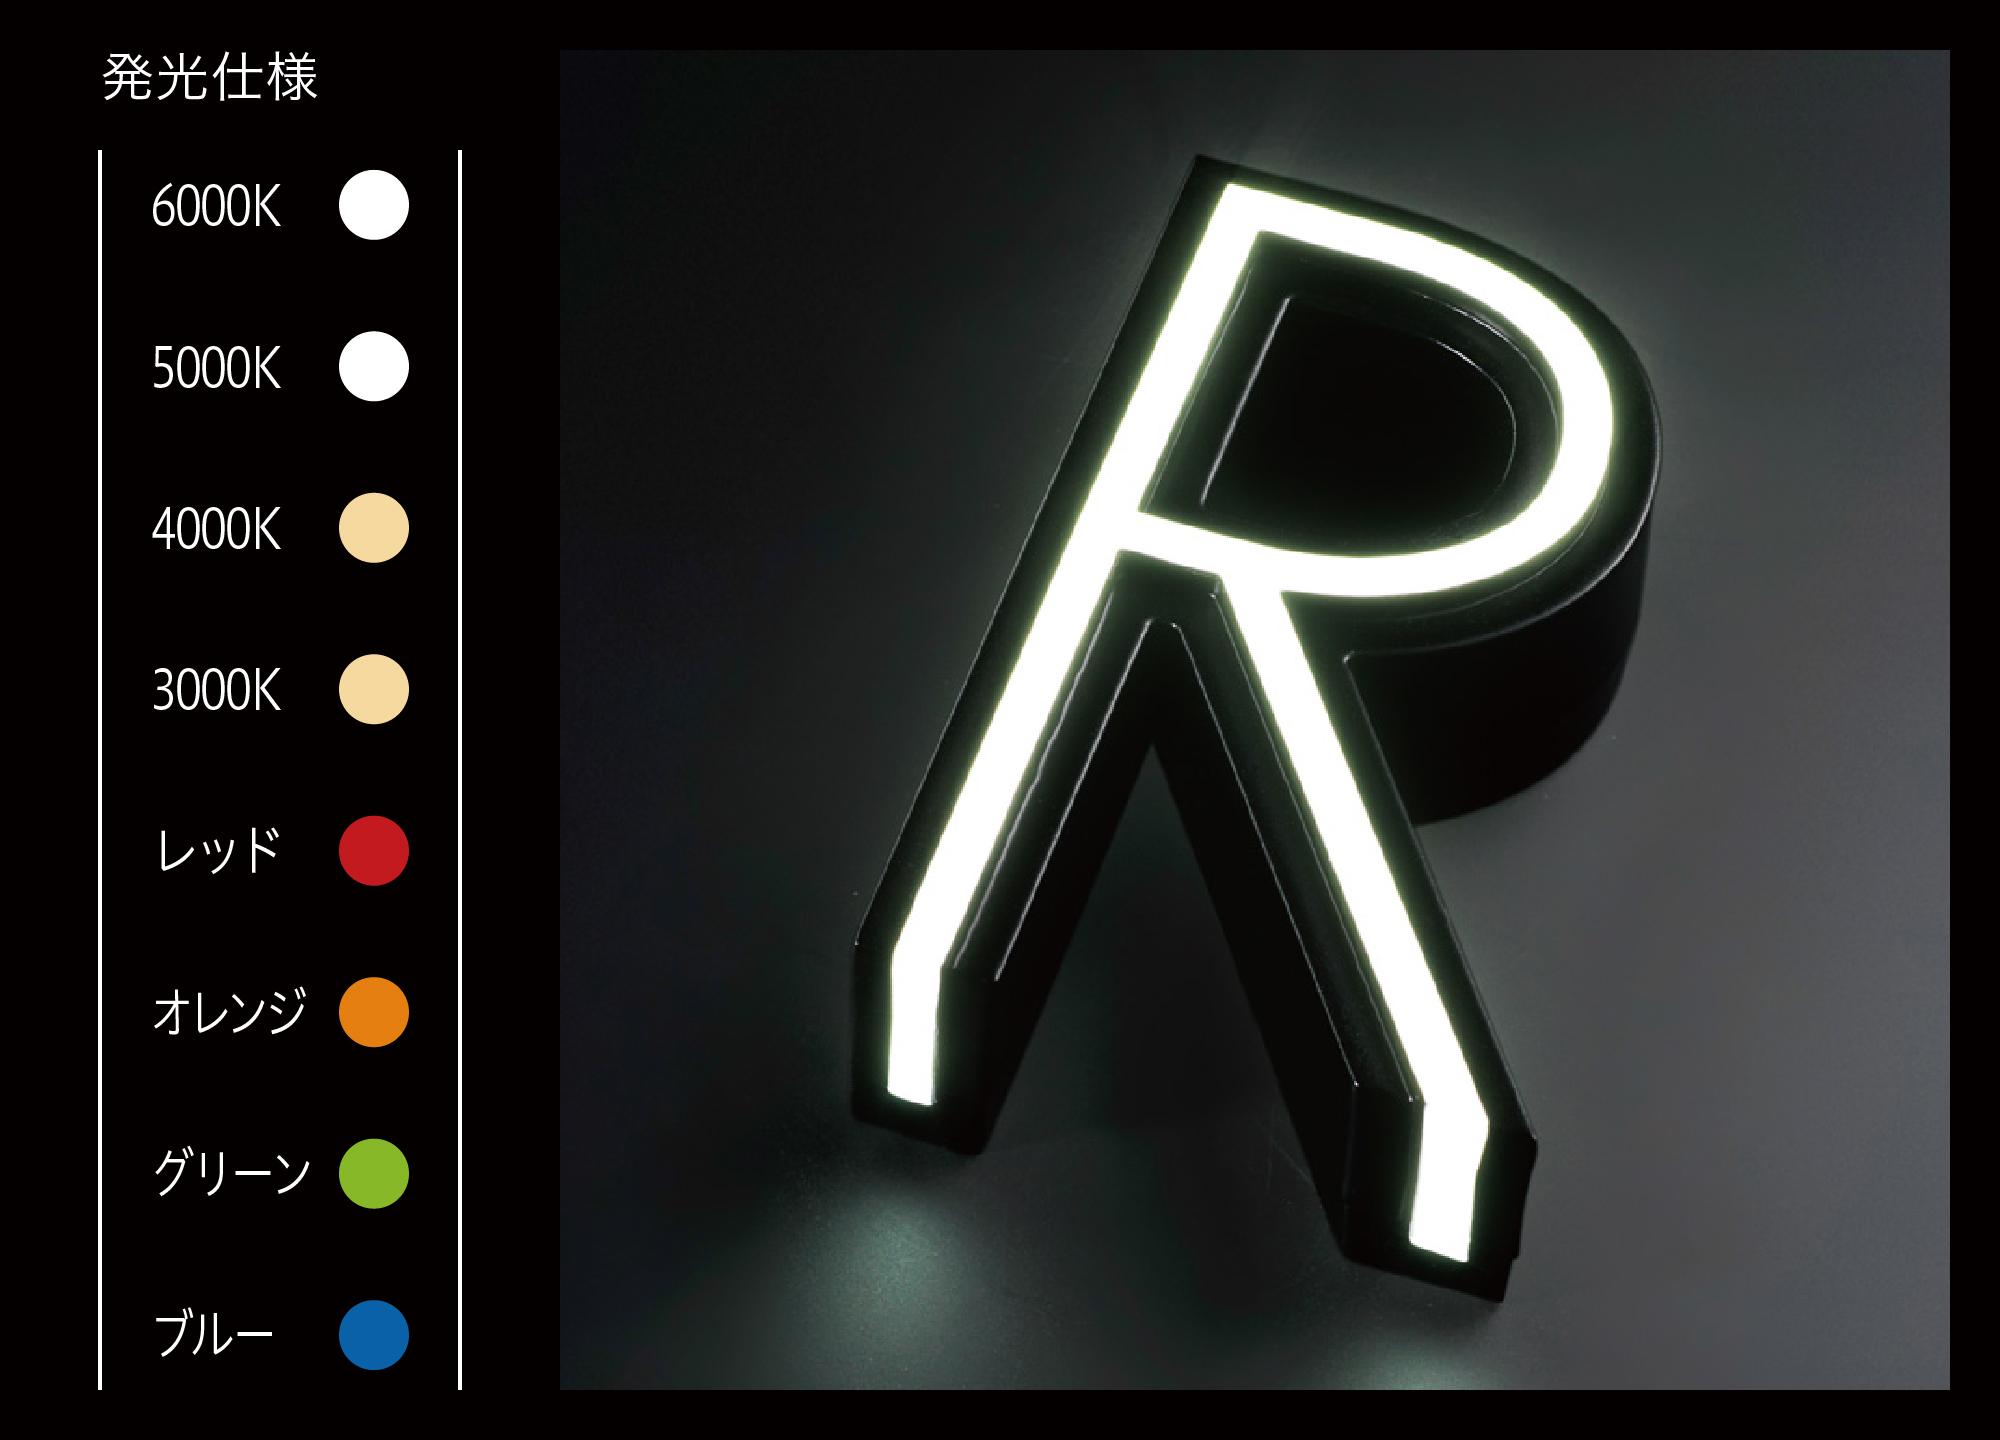 LEDサイン、LED看板のLEDIUS SIGN SLIT